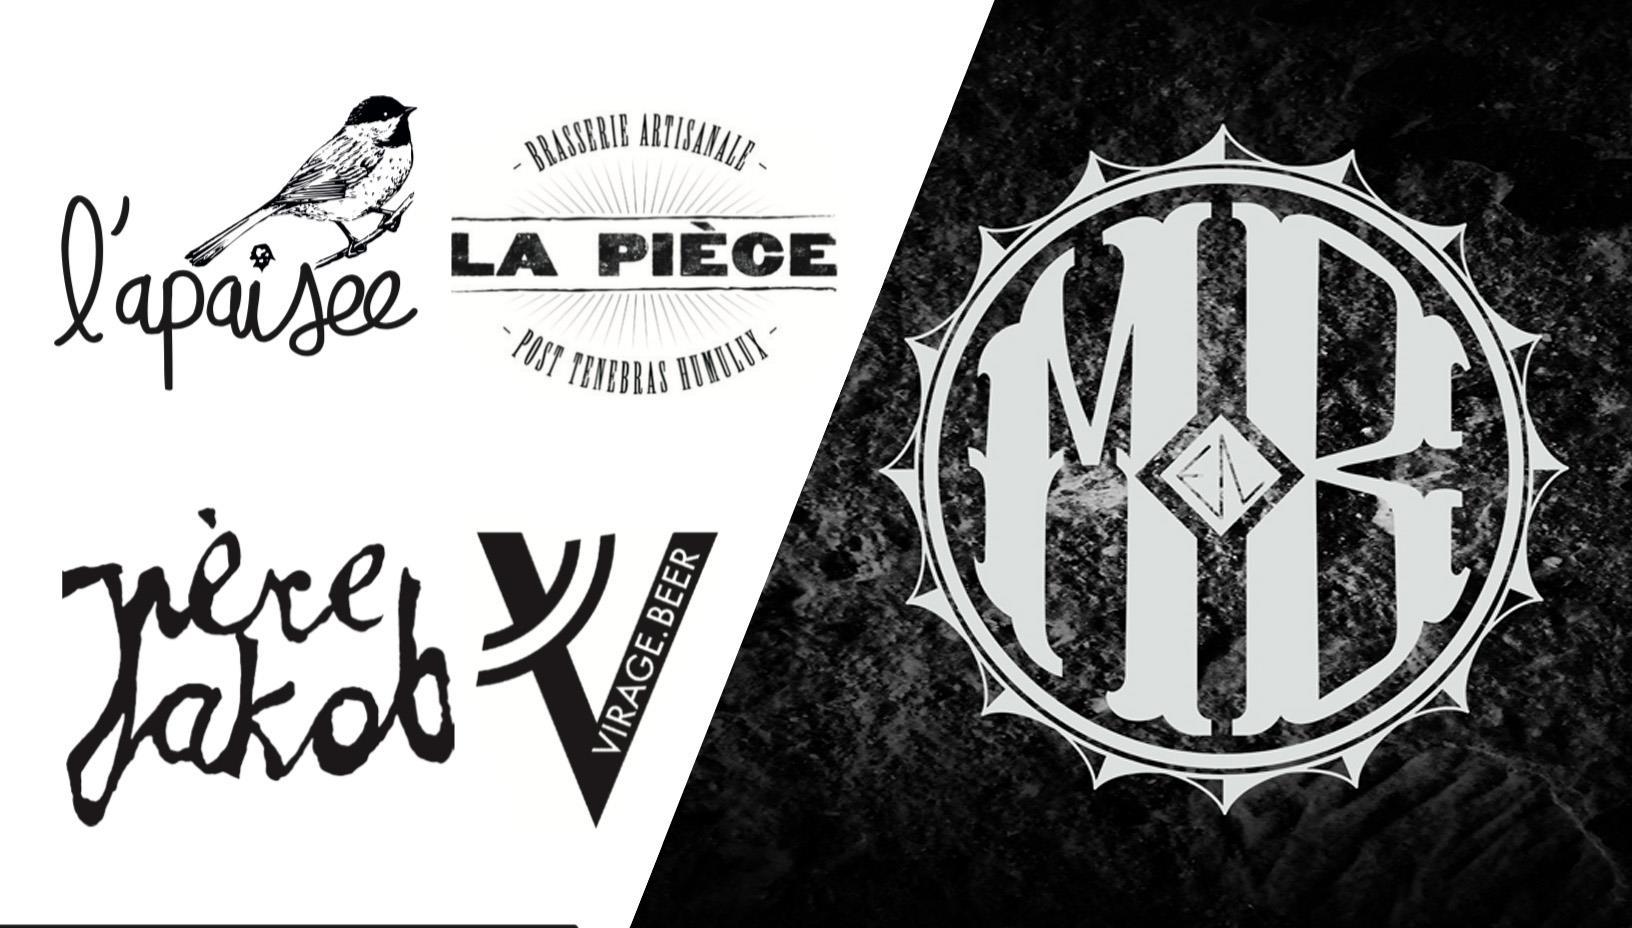 12.06.19 - TTO Les brasseries genevoises